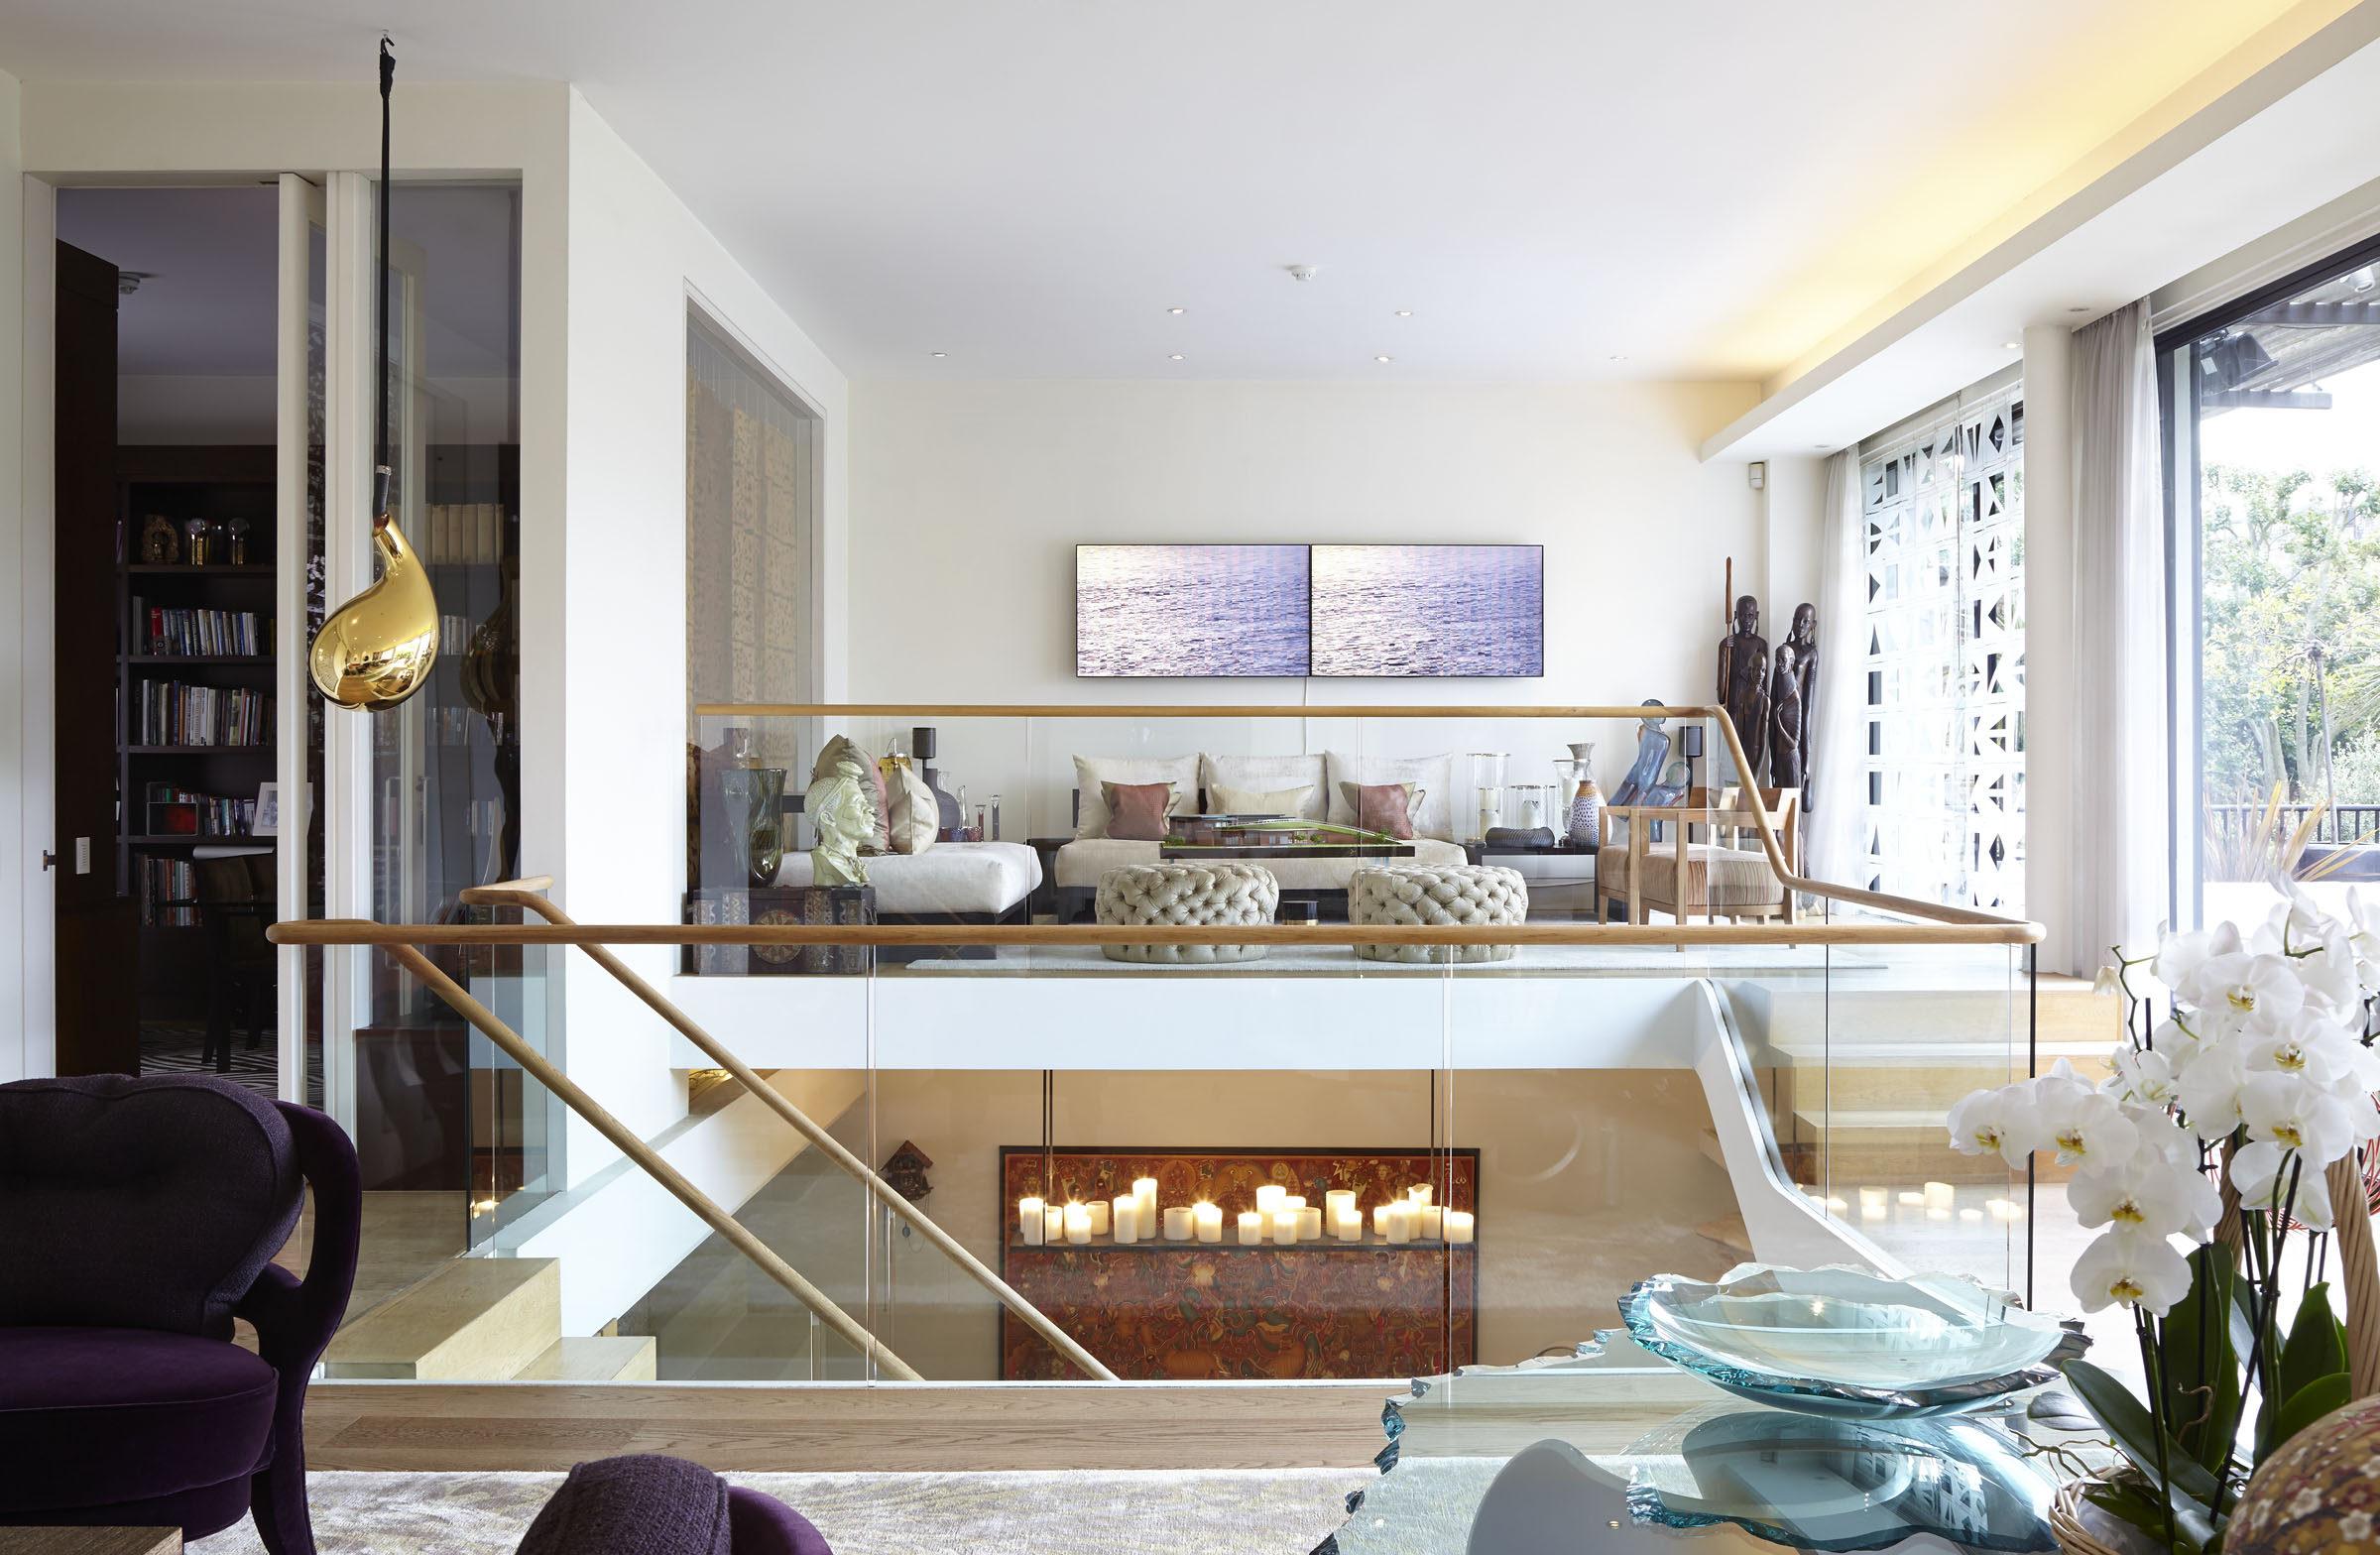 Hamilton terrace home london luxury interior design for Terrace interior design